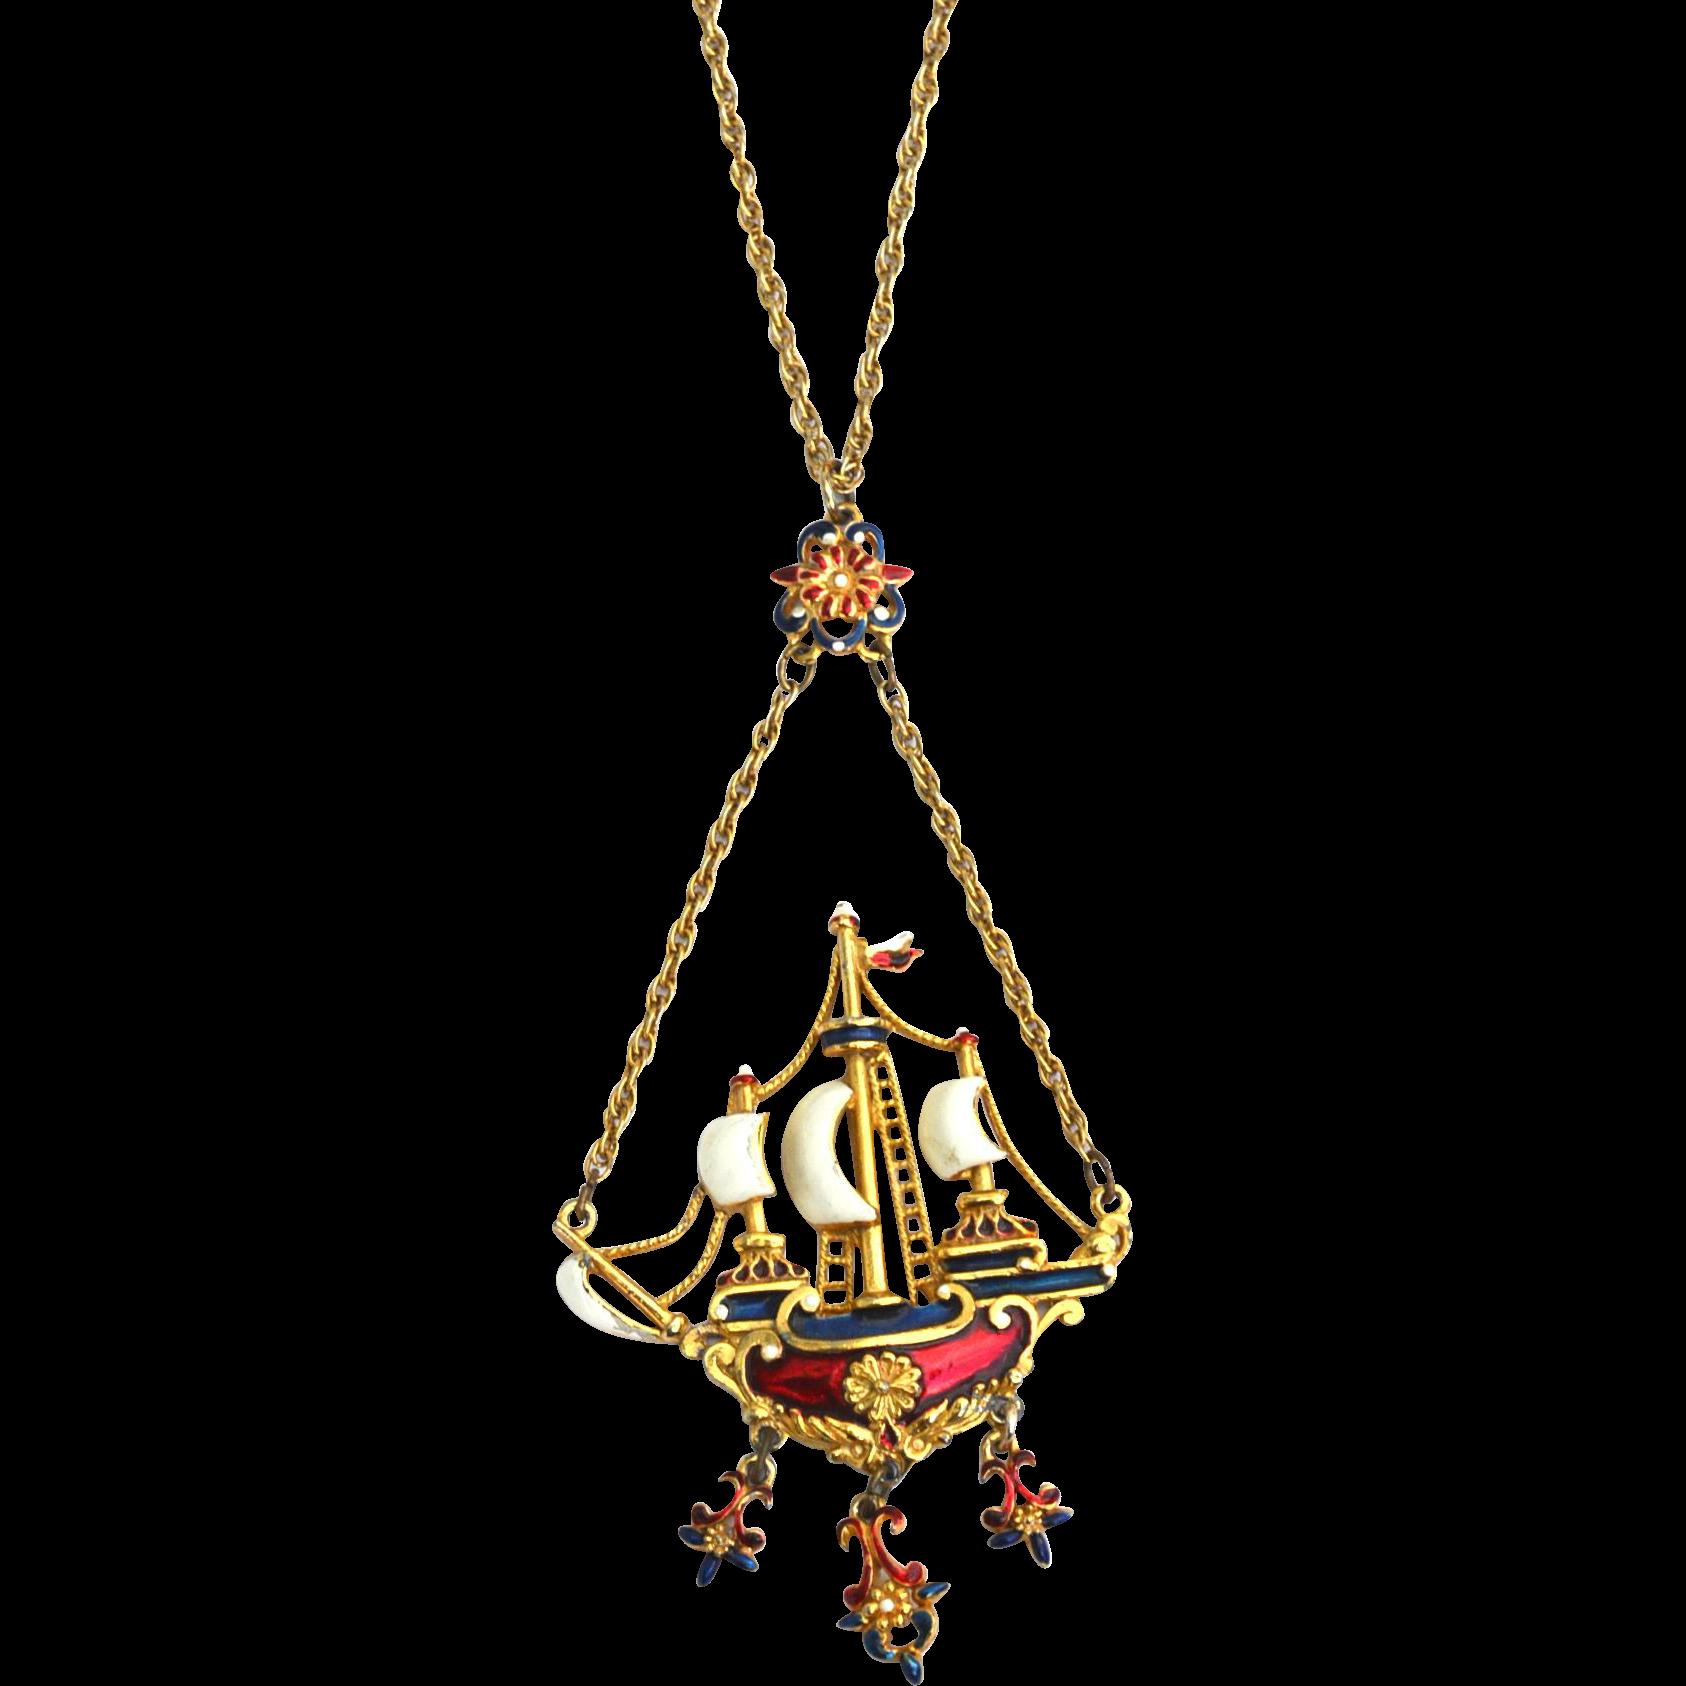 Amazing Signed SPHINX Large Enameled Dangling Ship Necklace